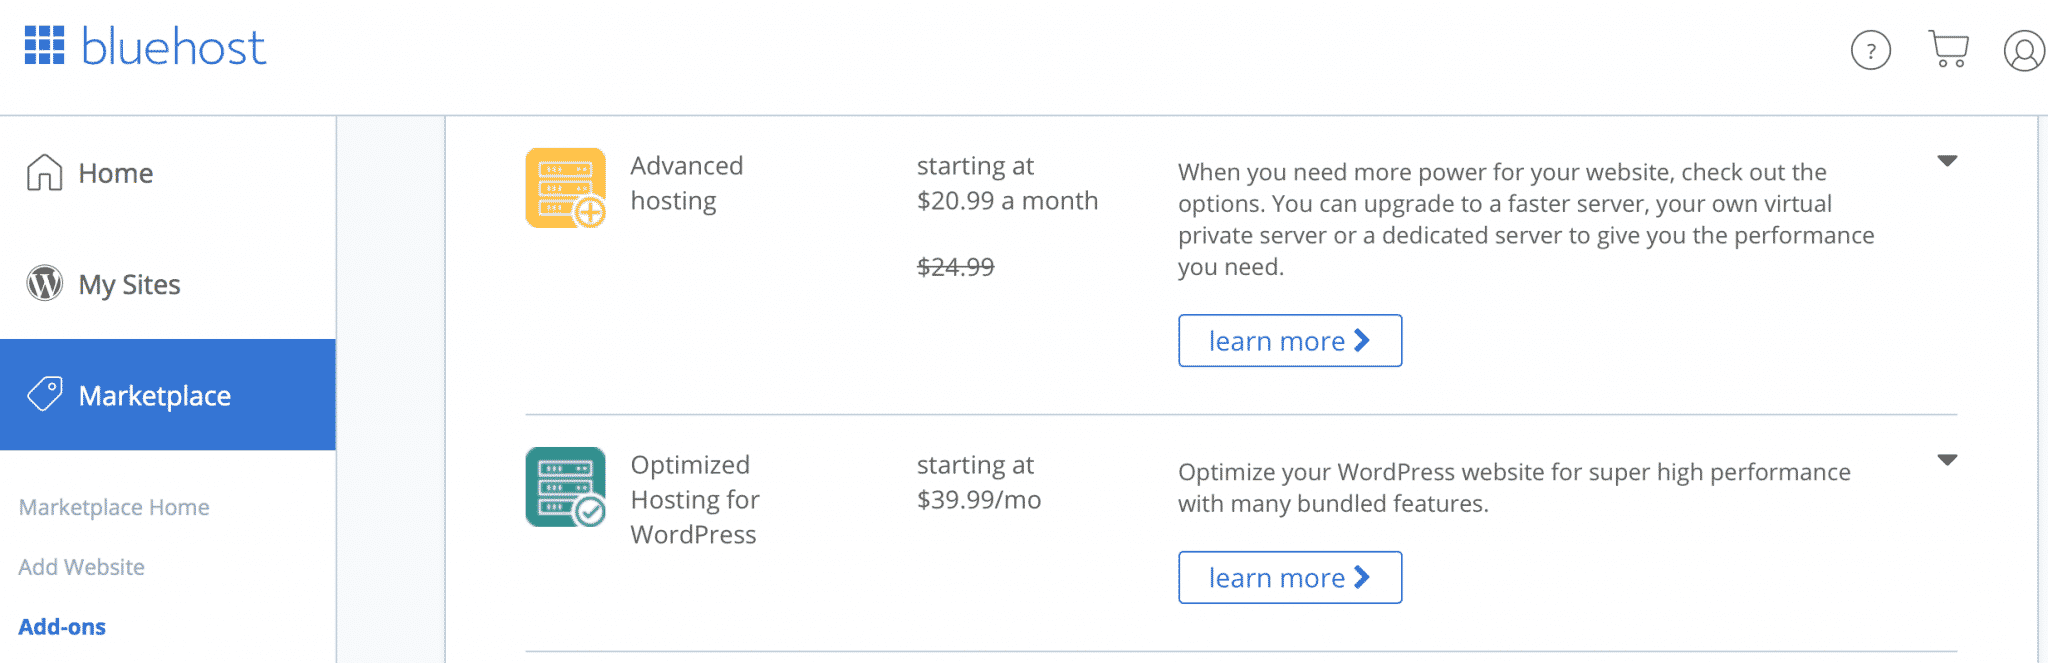 ecommerce hosting plan